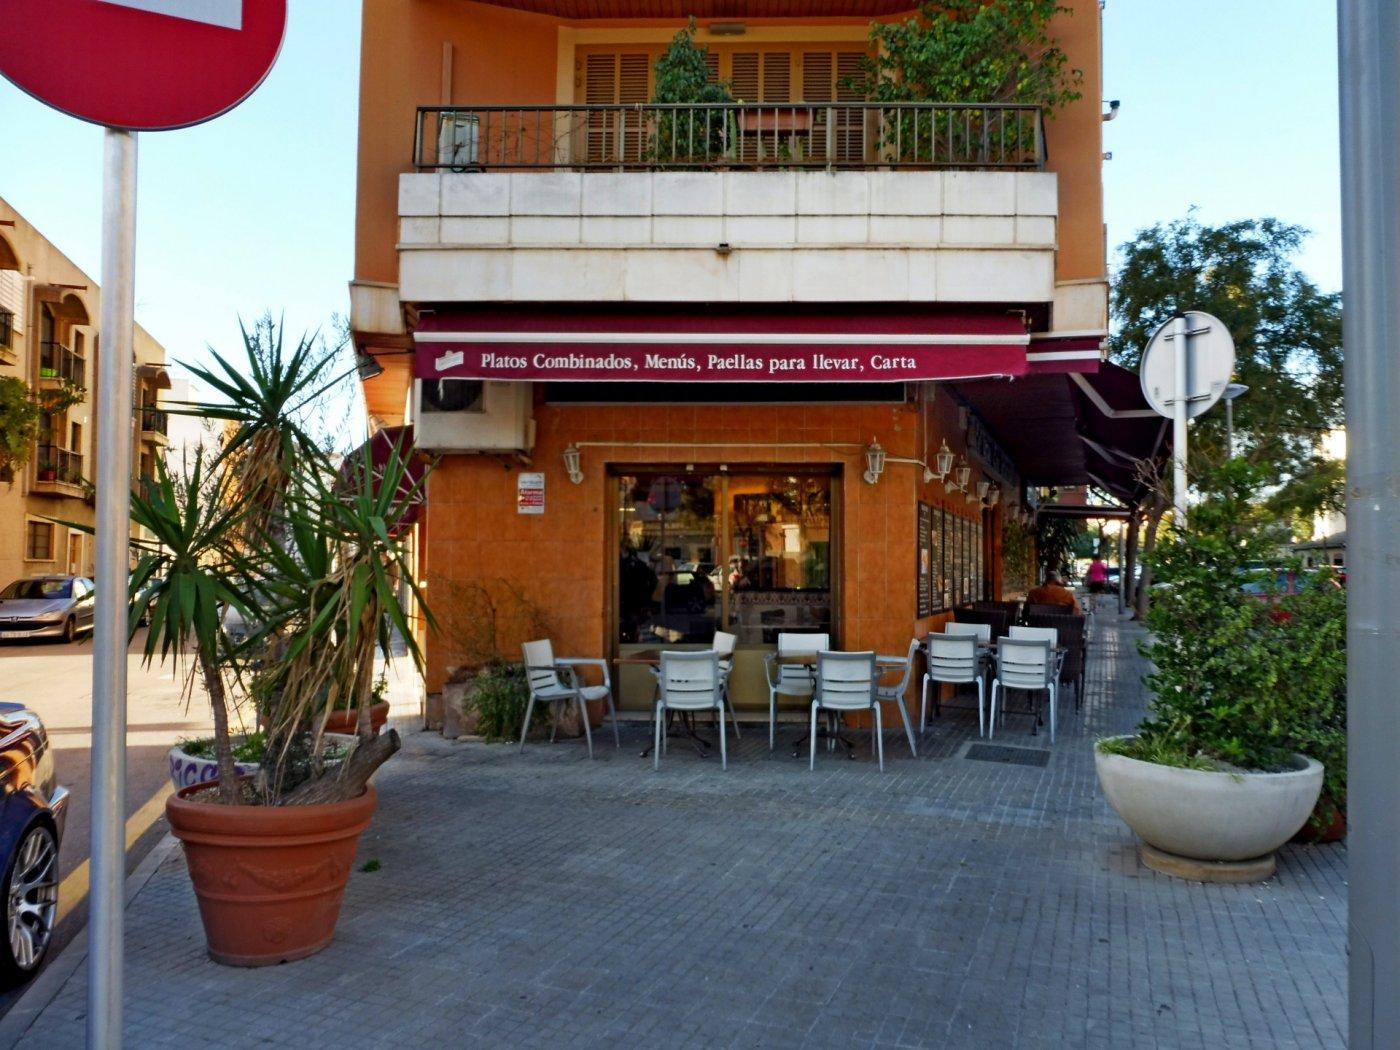 Traspaso Local Comercial  Palma de mallorca ,son forteza. Se traspasa restaurante en son forteza con 30 años en funcionami